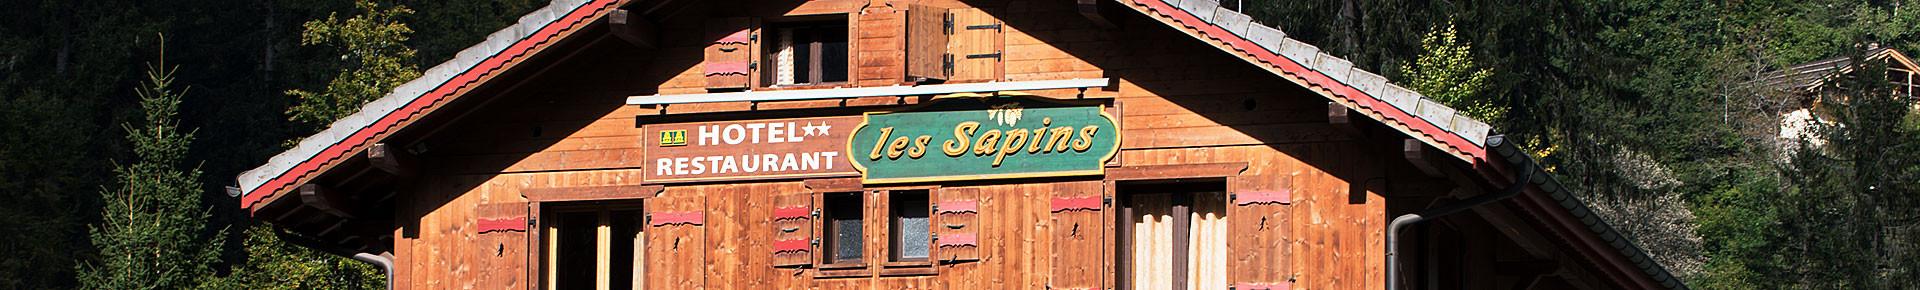 Bars restaurant les Sapins